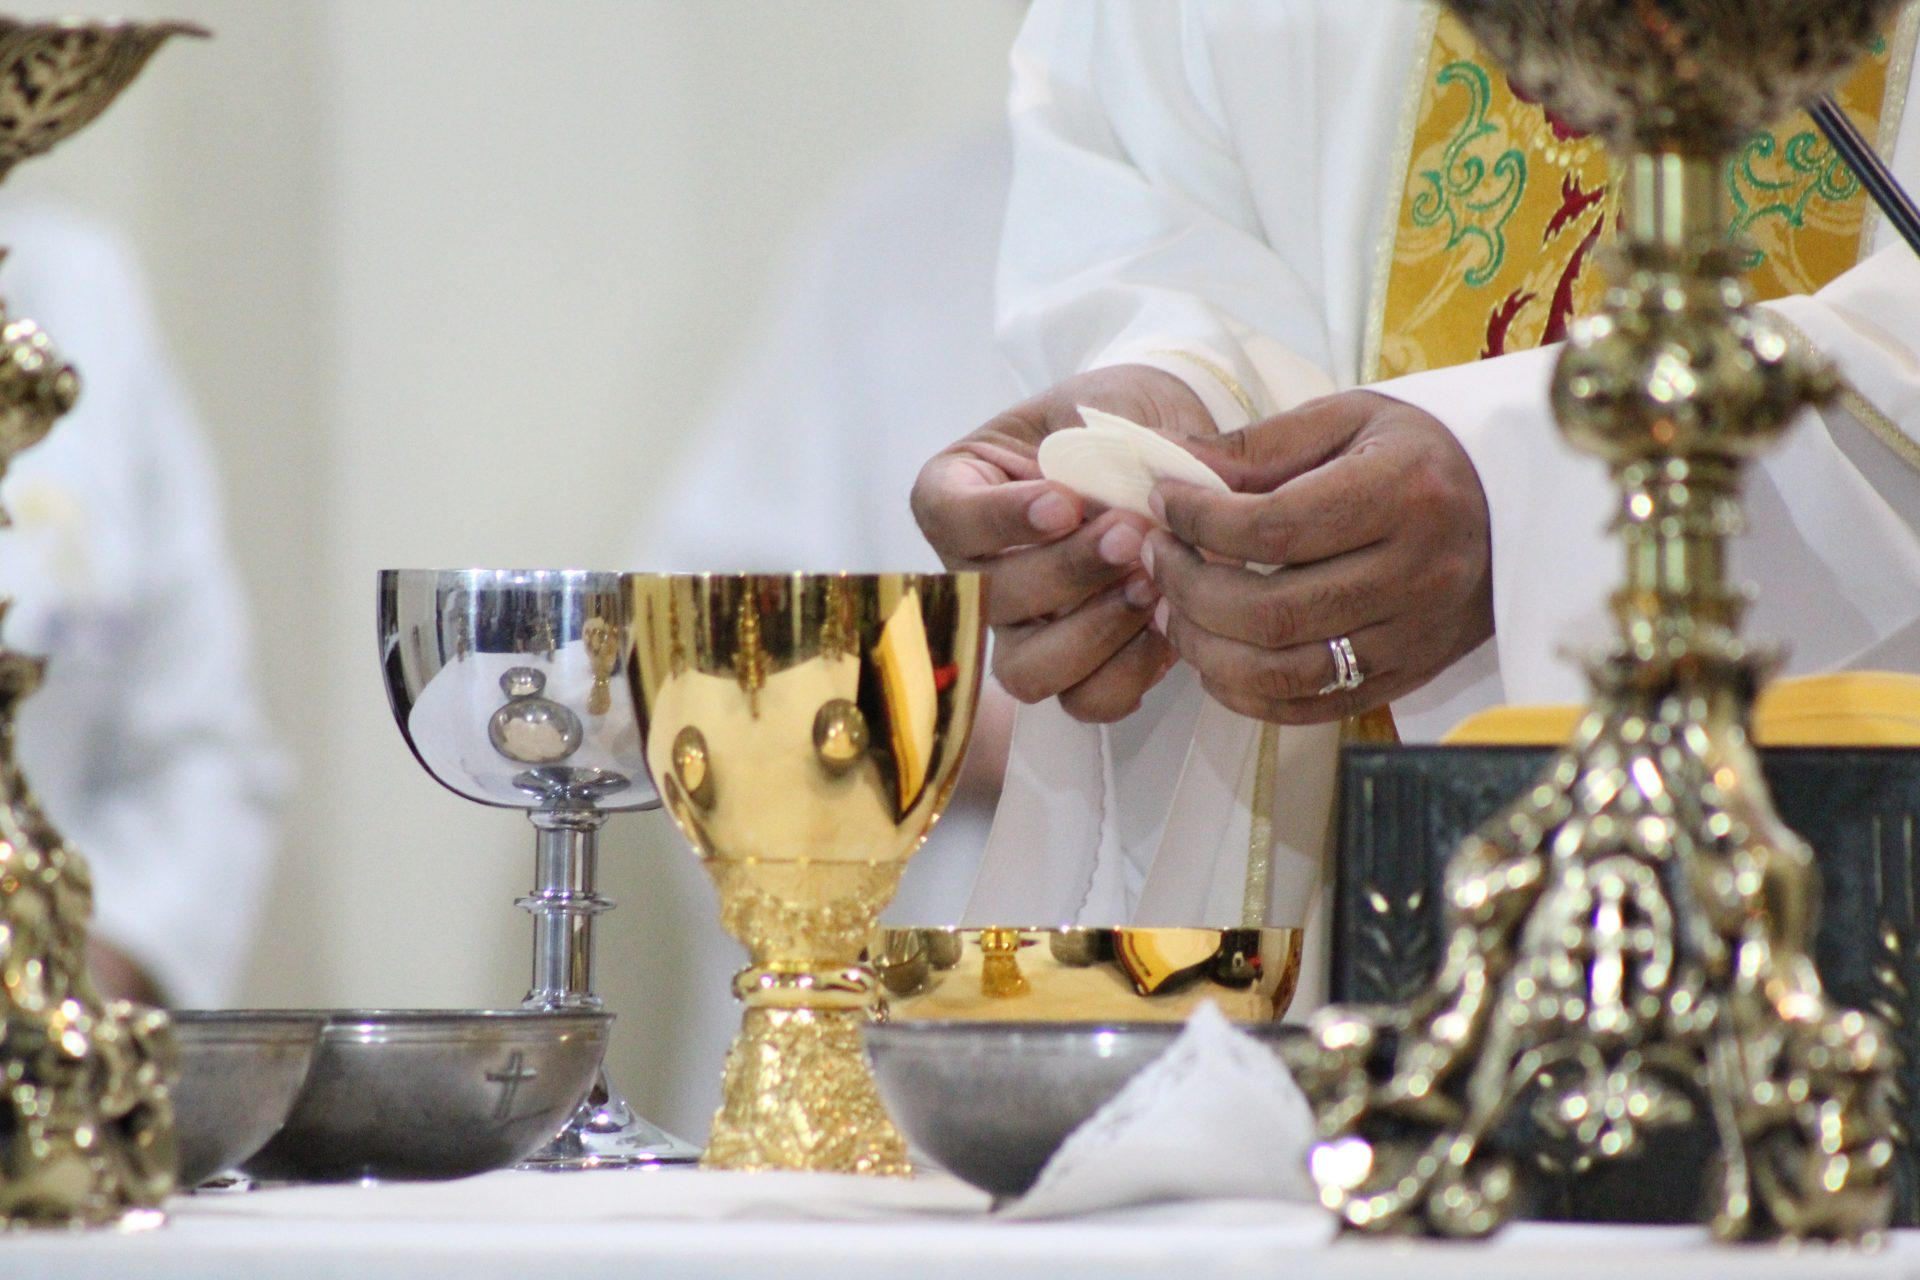 Festa da Sagrada Família | 27/12/2020